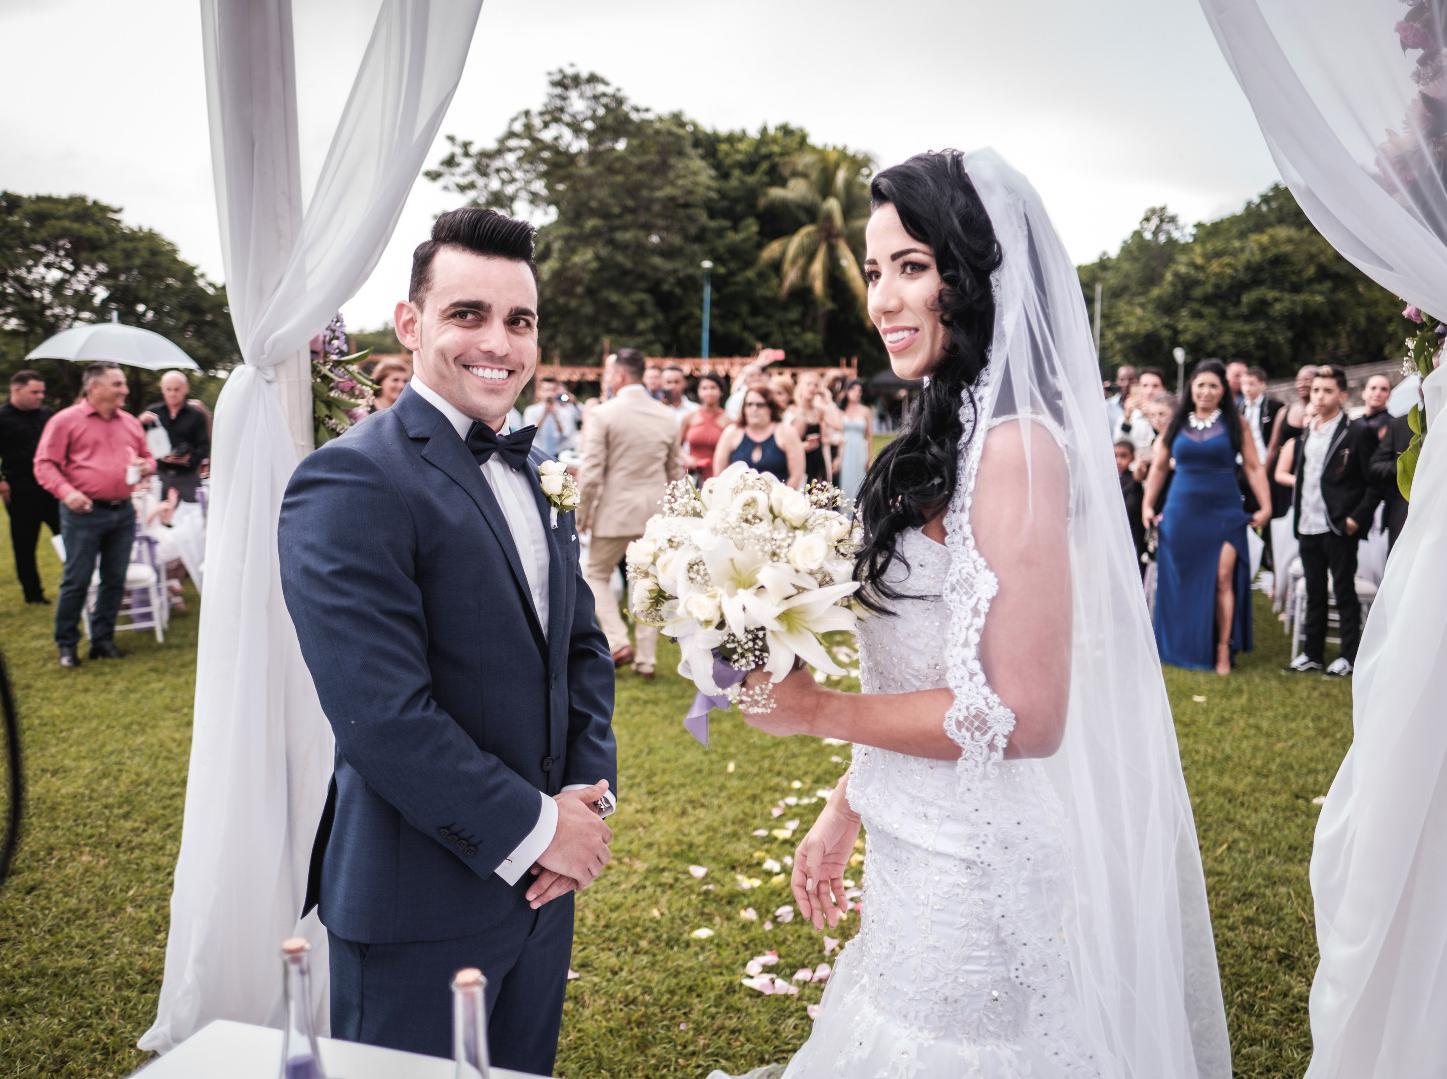 bodas-sin-clasificar-sin-tema-cuba-35571.jpg